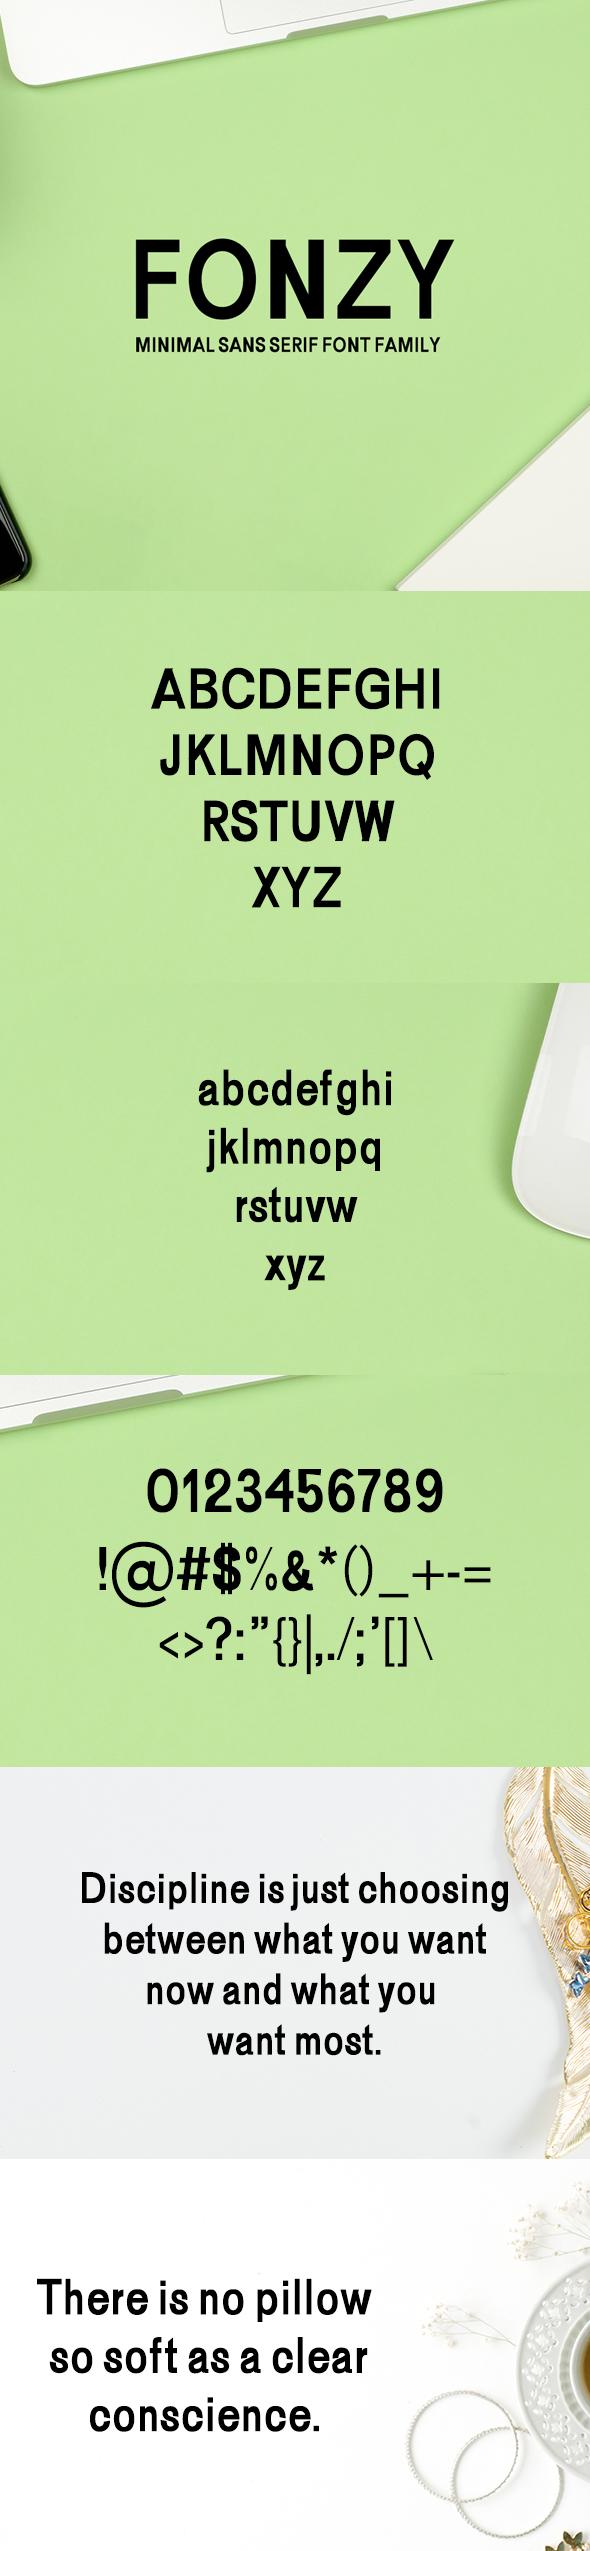 Fonzy Minimal Sans Serif 5 Font Pack - Sans-Serif Fonts